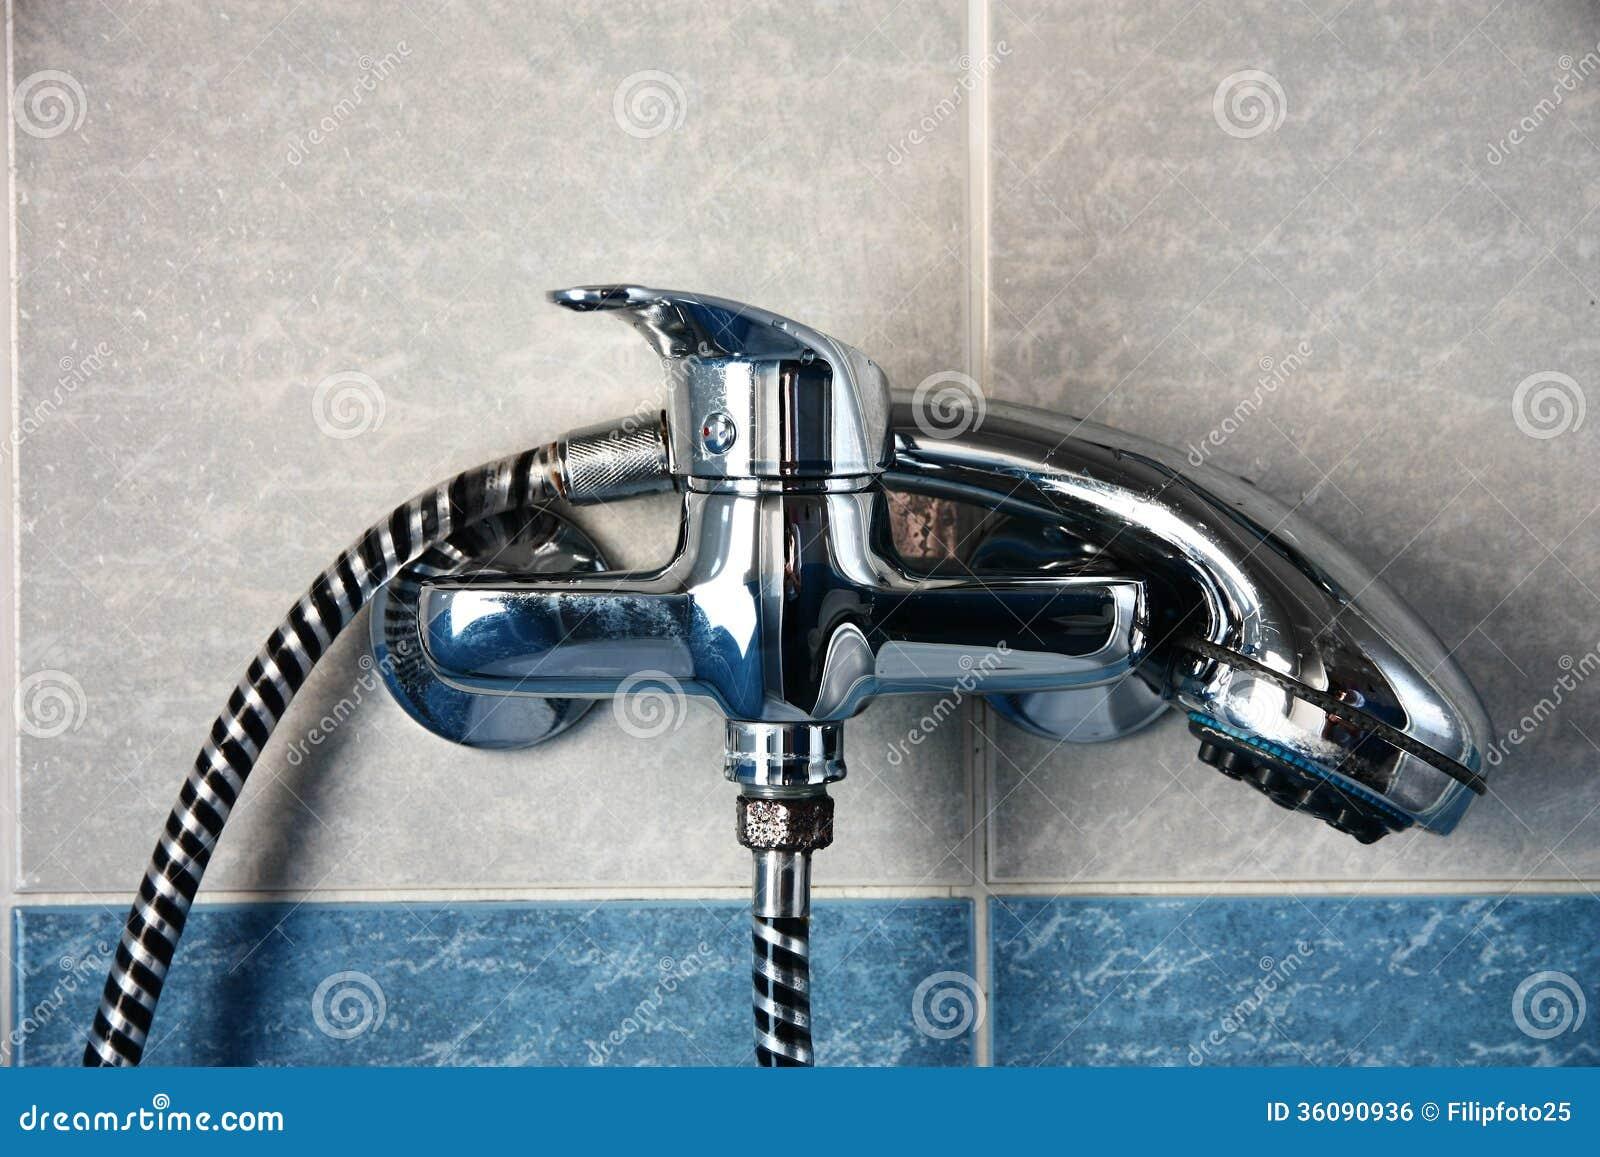 Bathroom tab stock photo. Image of bathroom, powder, bath - 36090936